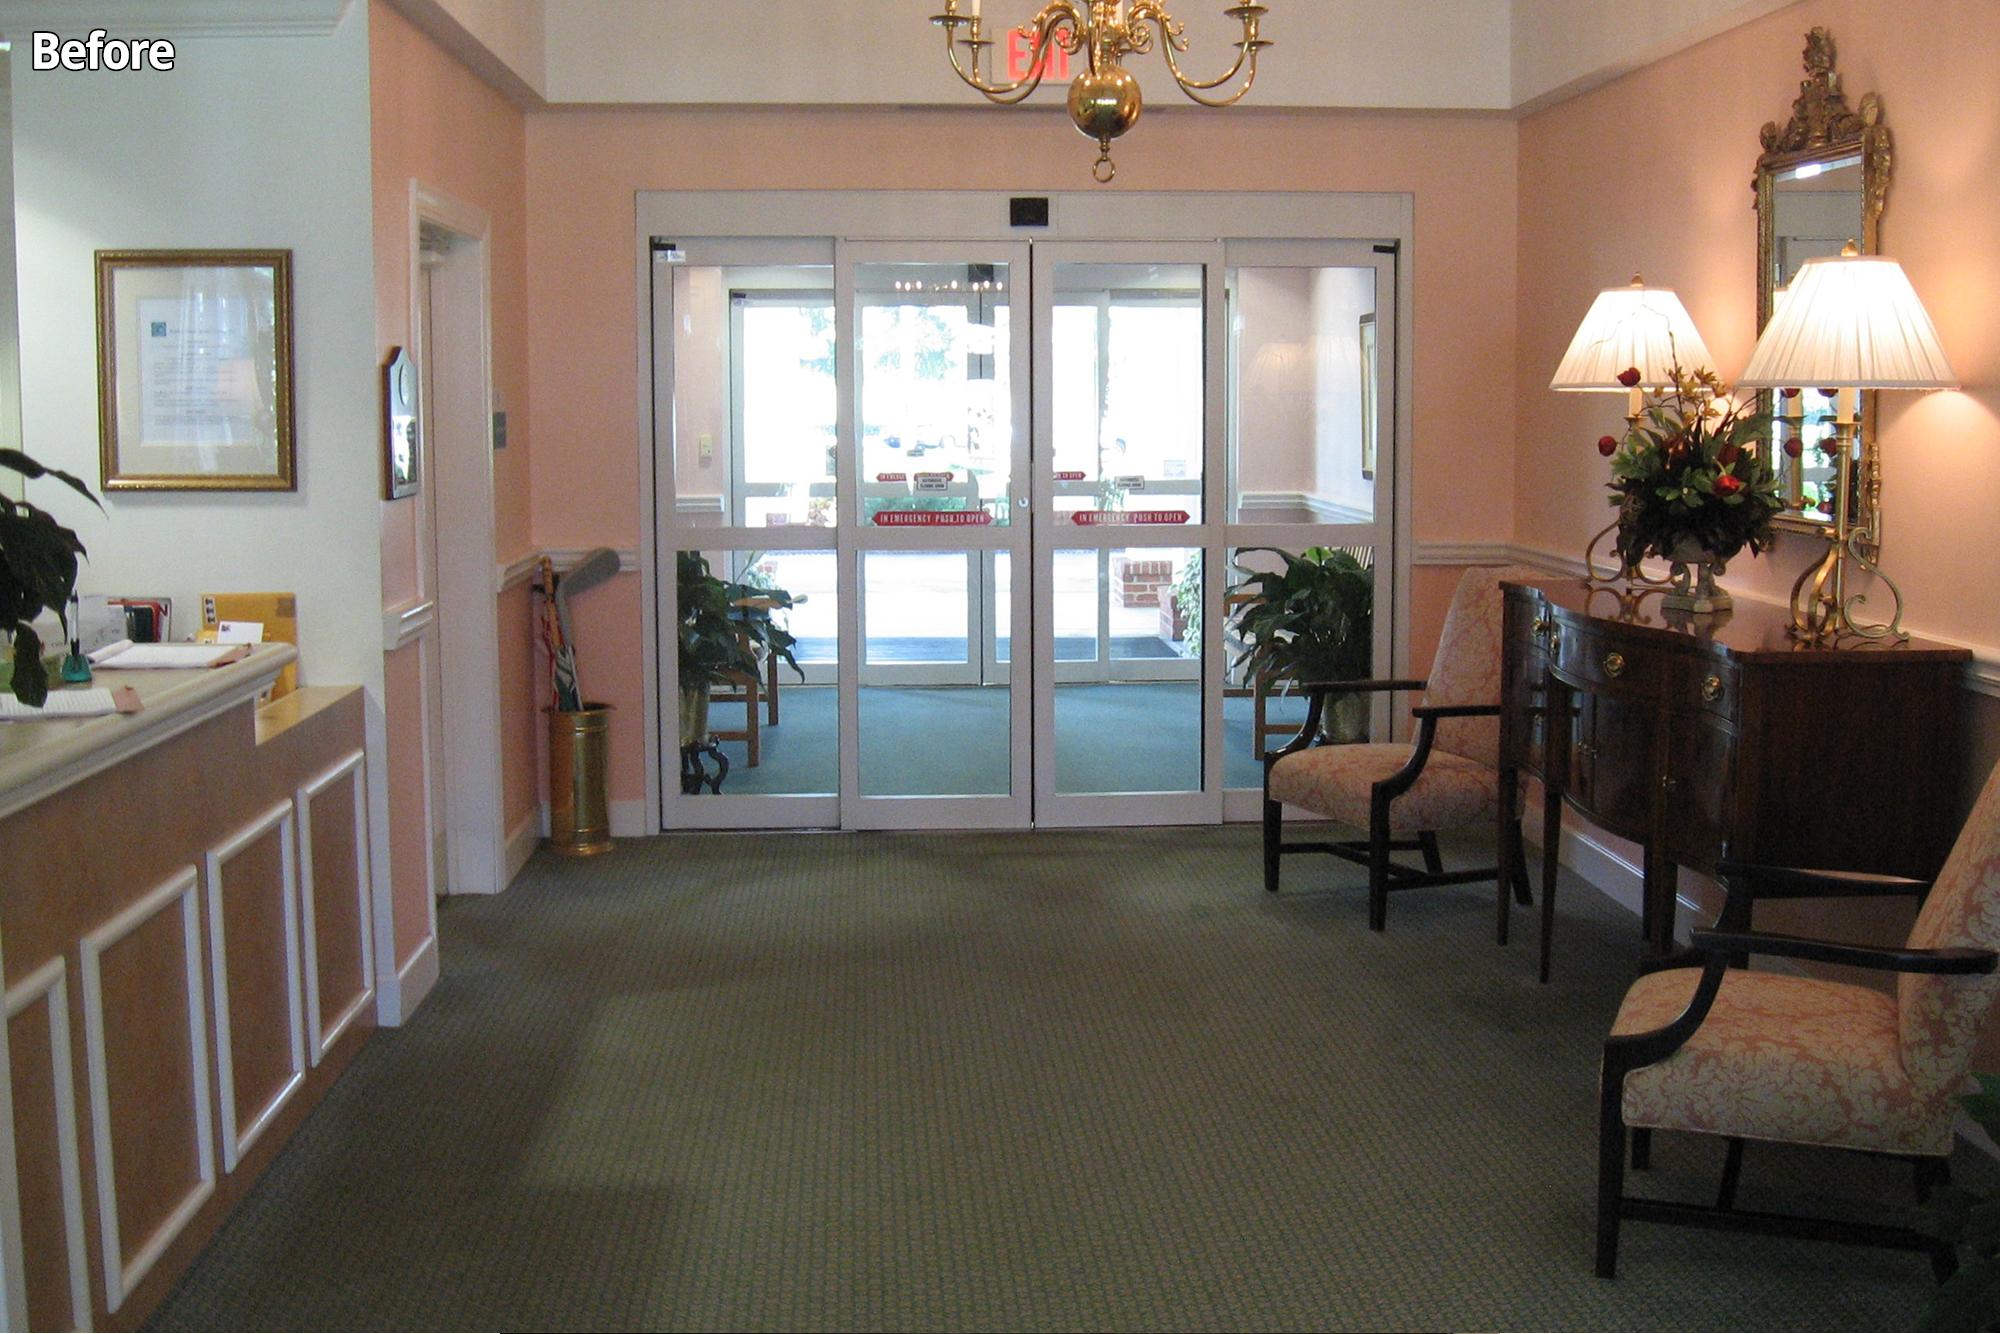 Senior Living Facility Photo